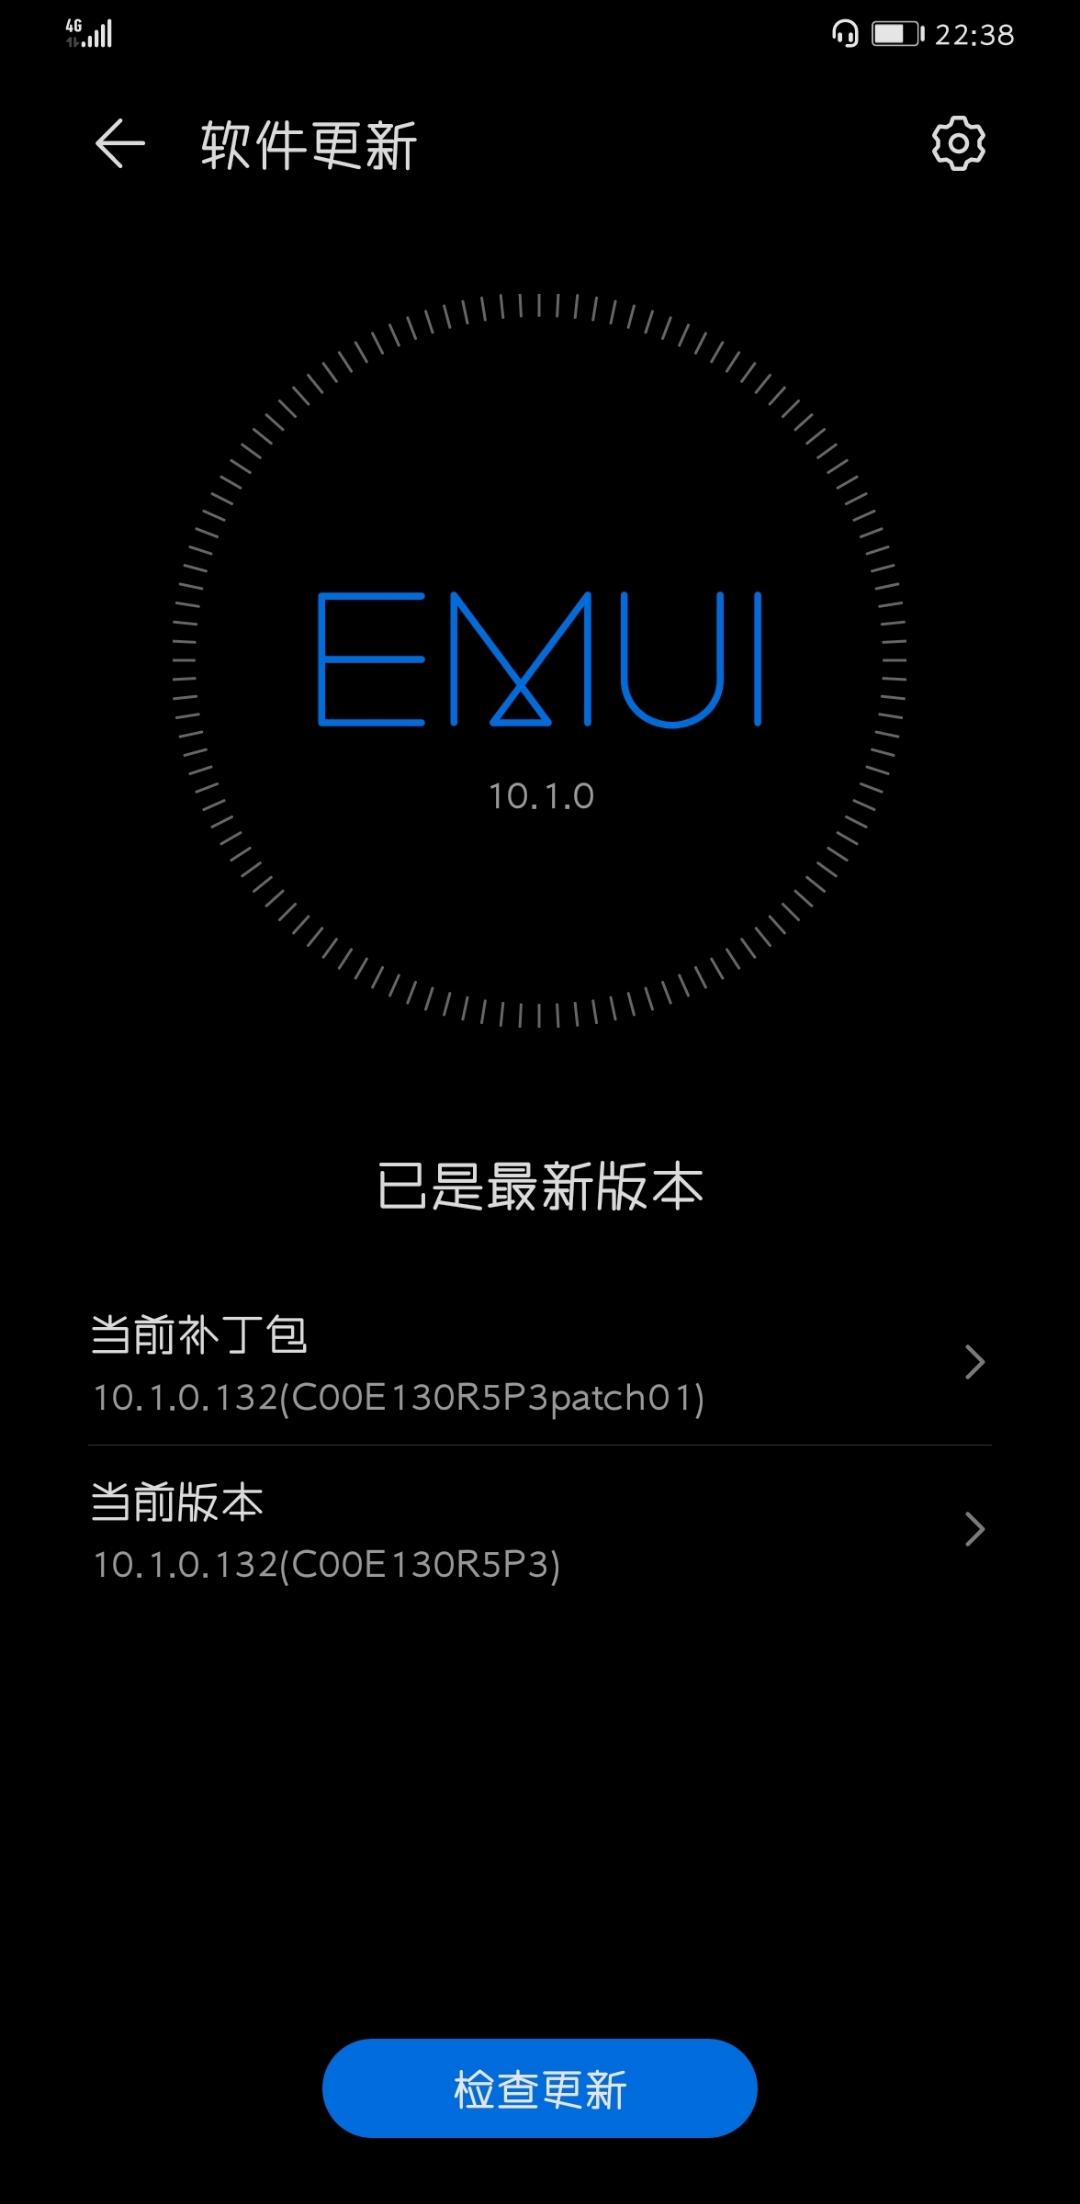 Screenshot_20200513_223841_com.huawei.android.hwouc.jpg